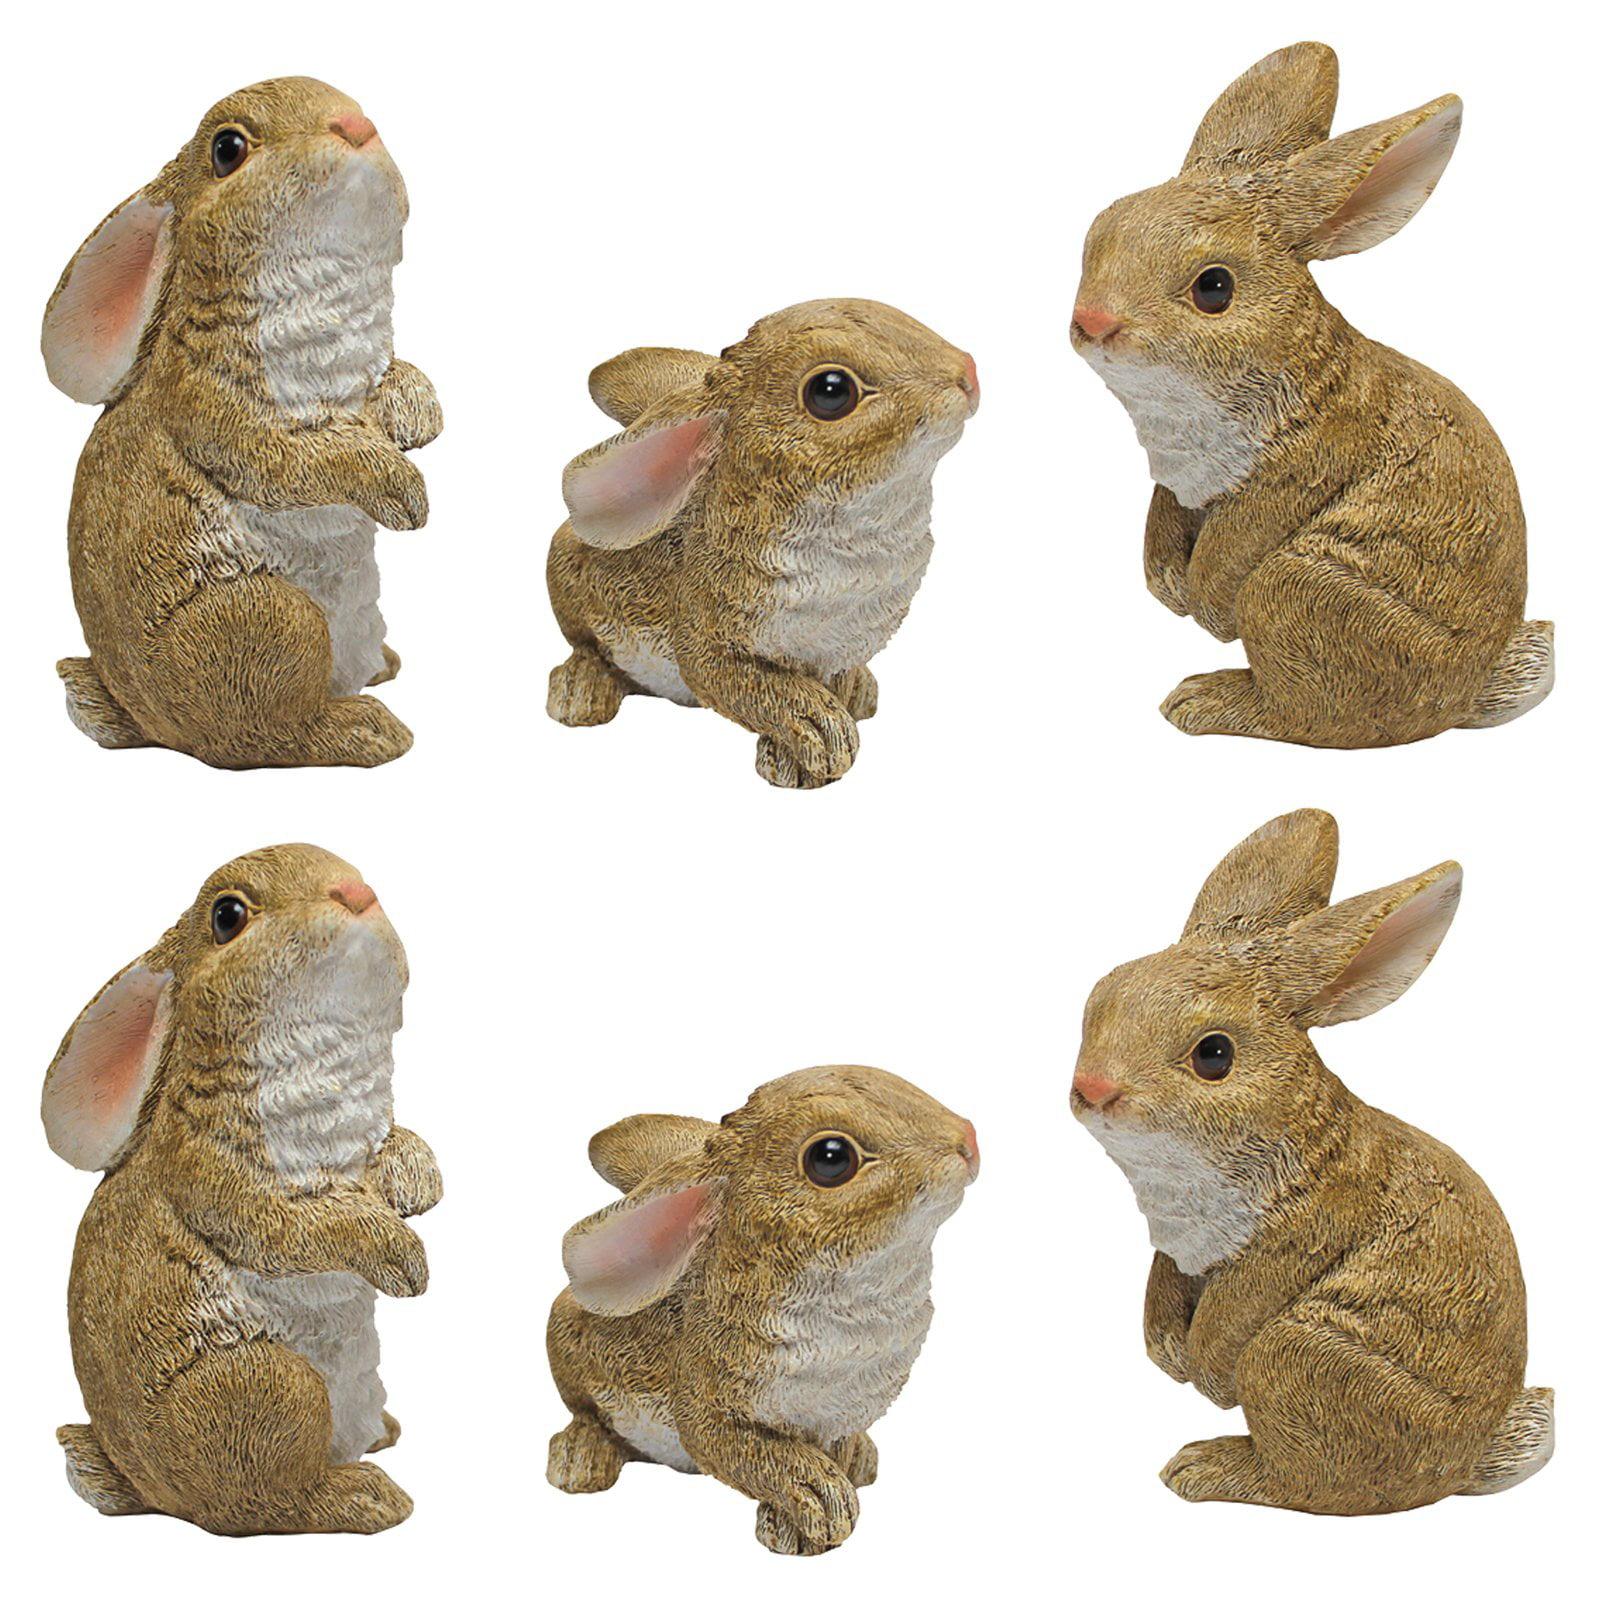 Design Toscano The Bunny Den Rabbit Garden Statue - Set of 6